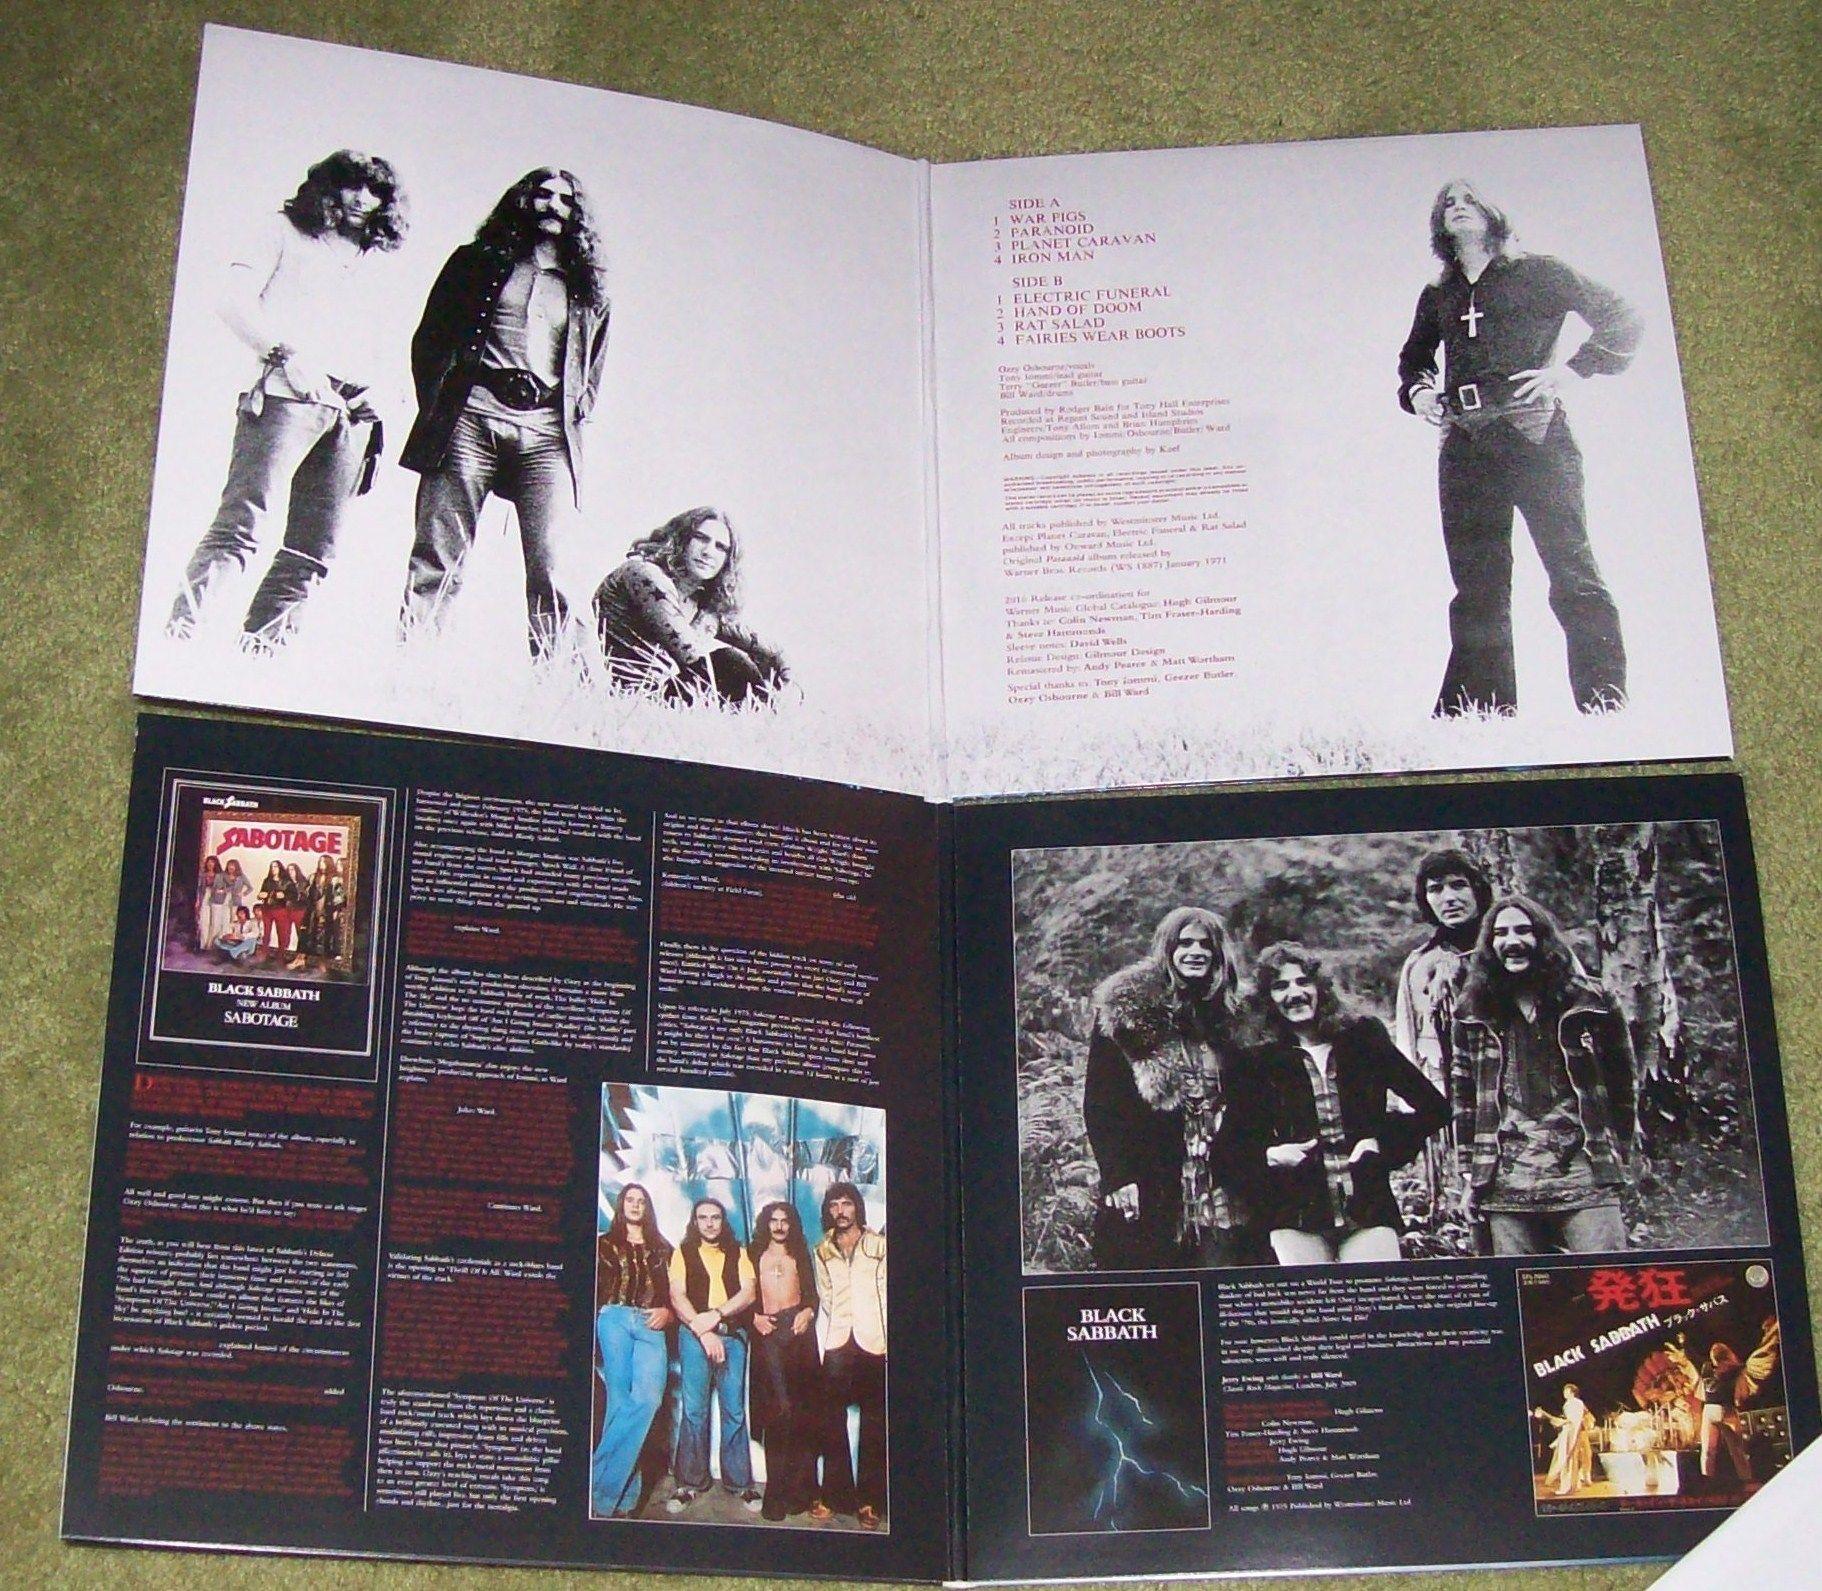 Black Sabbath Re Issue Gatefolds Black Sabbath Vinyl Records Vinyl